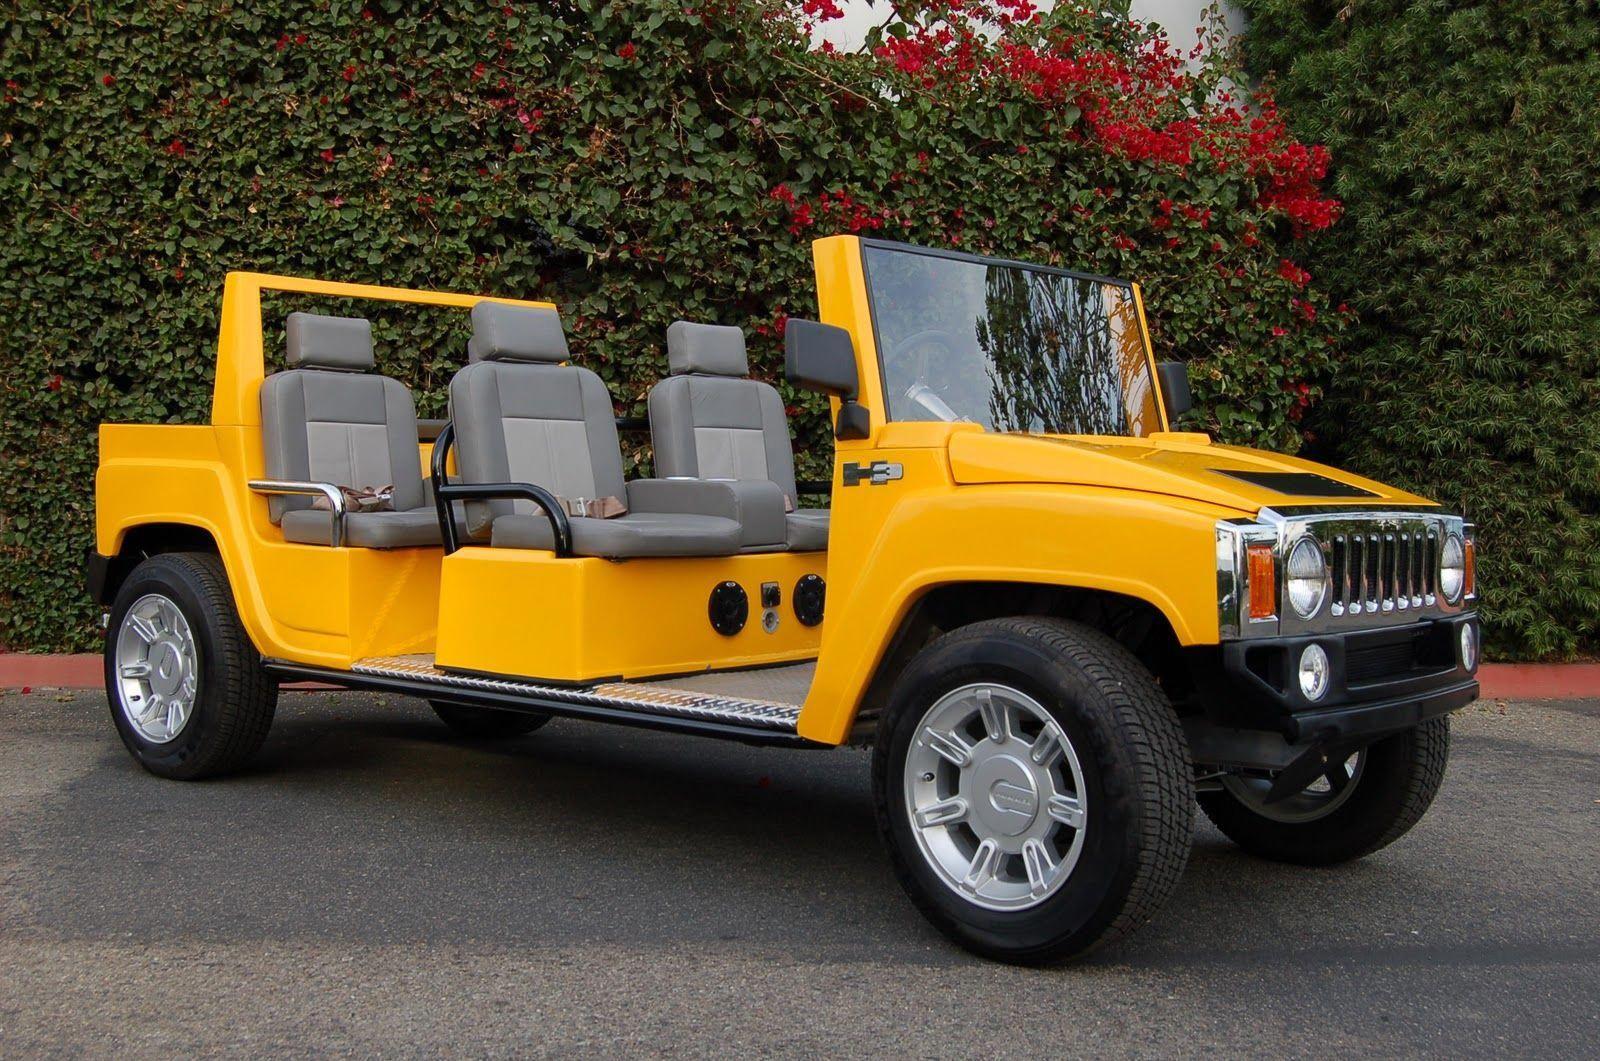 Sports Car Hummer Wallpaper Pictures Images Snaps Photo Kids Power Wheels Golf Carts Hummer Golf Cart